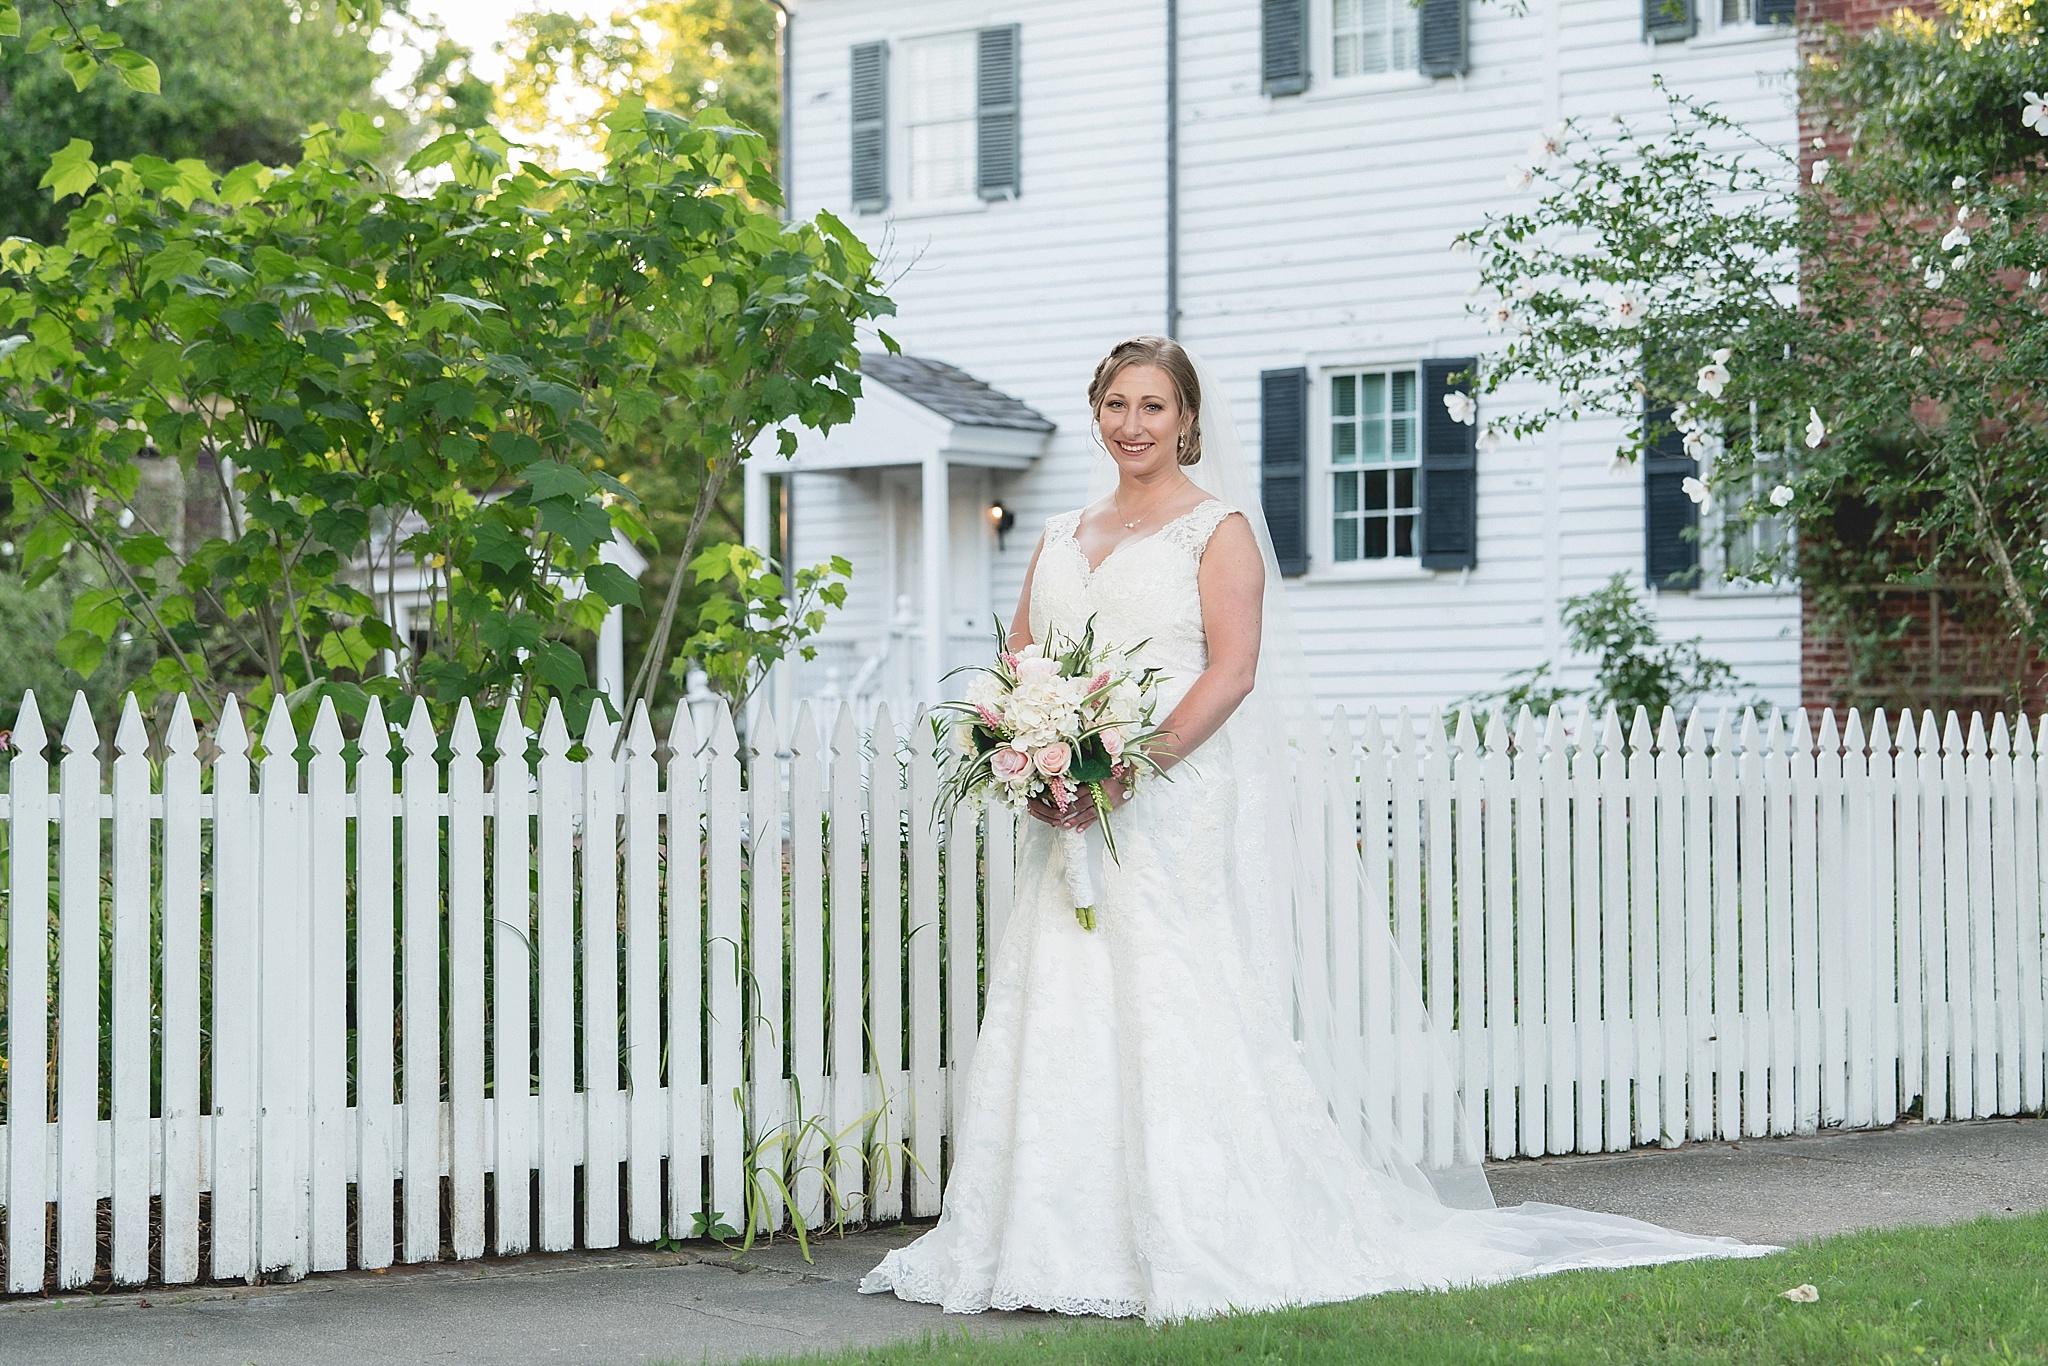 New-Bern-NC-Wedding-Photographer-067.jpg